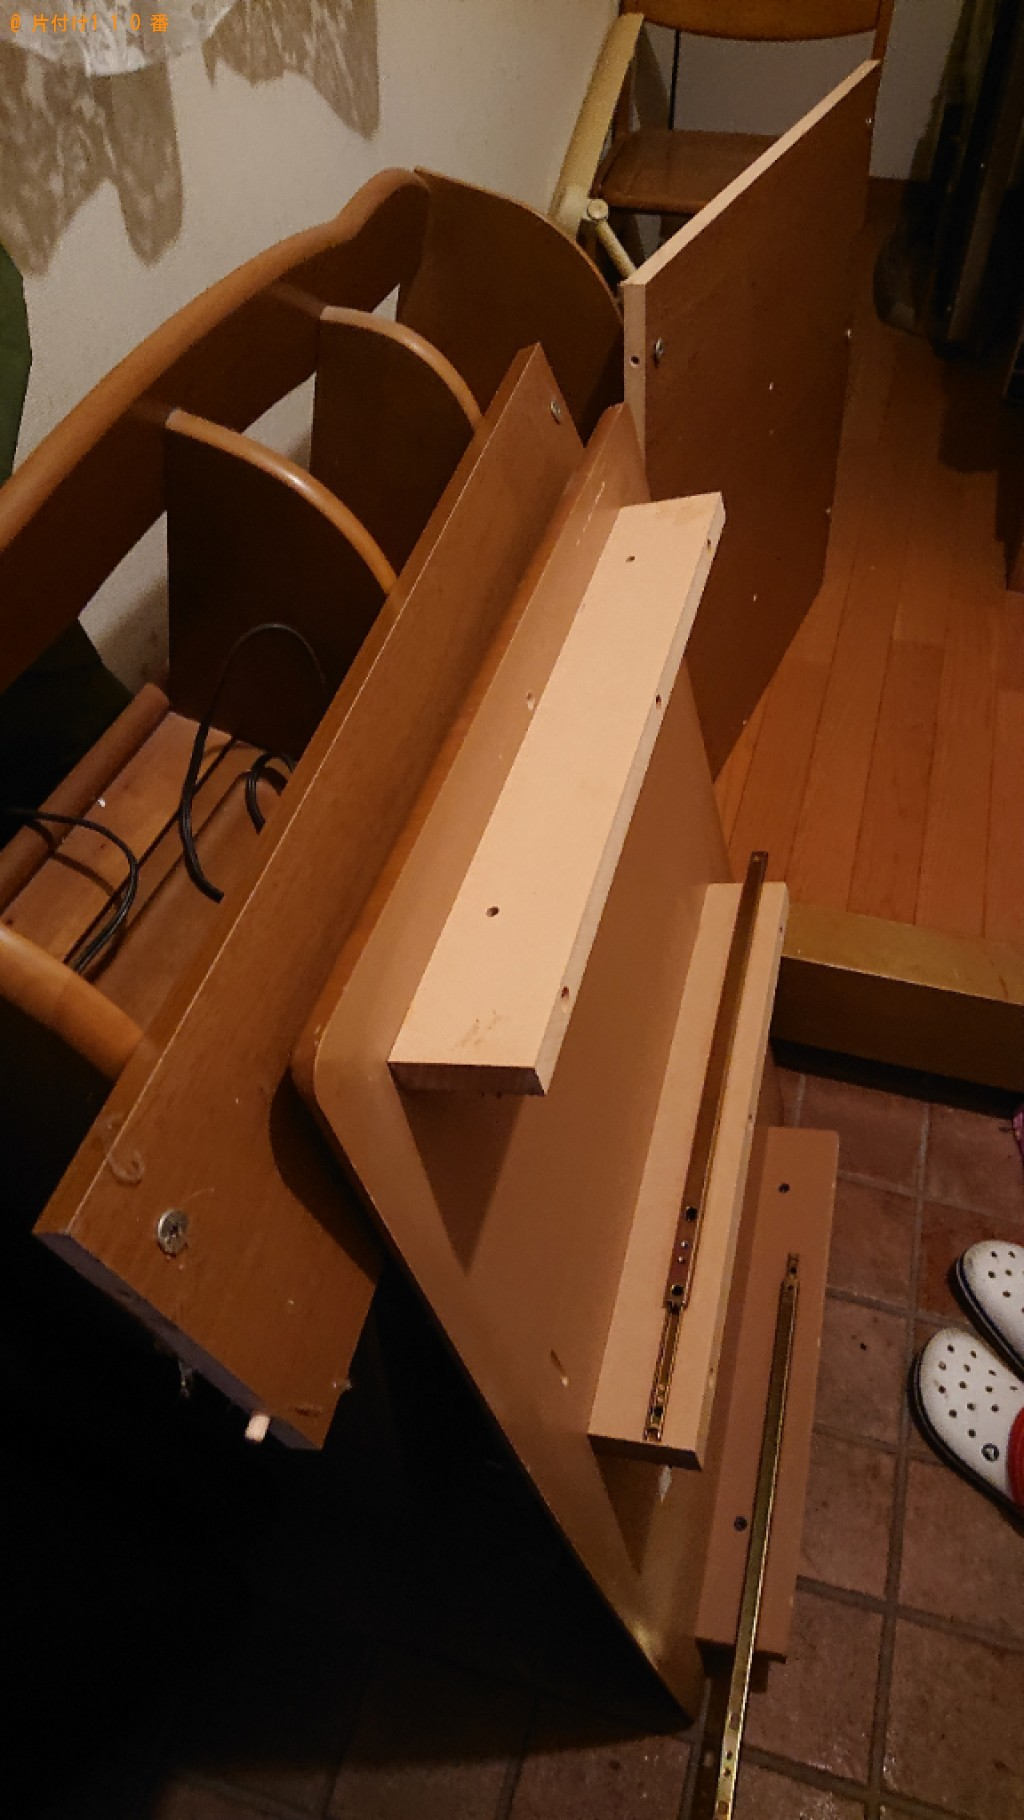 【京都市山科区】学習机、椅子の回収・処分ご依頼 お客様の声